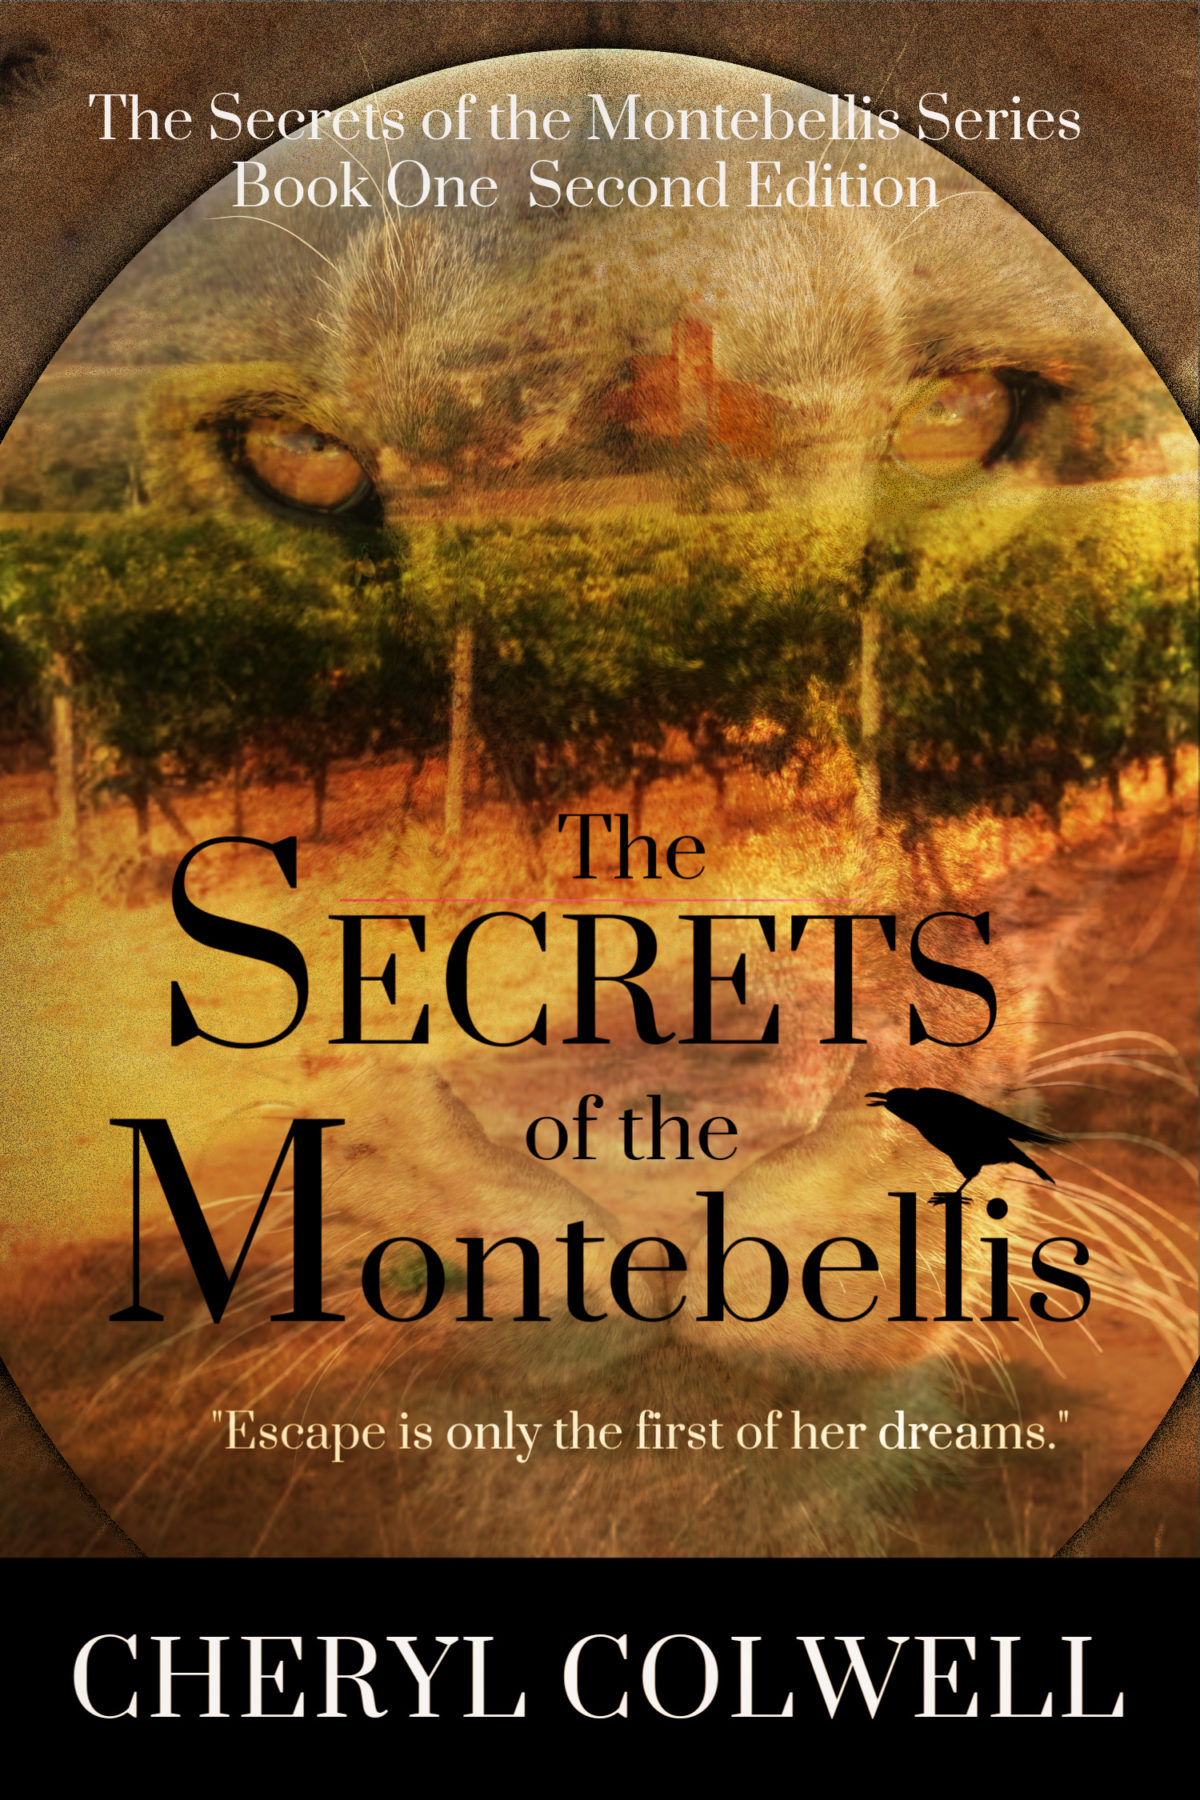 Secrets of the Montebellis Book Cover